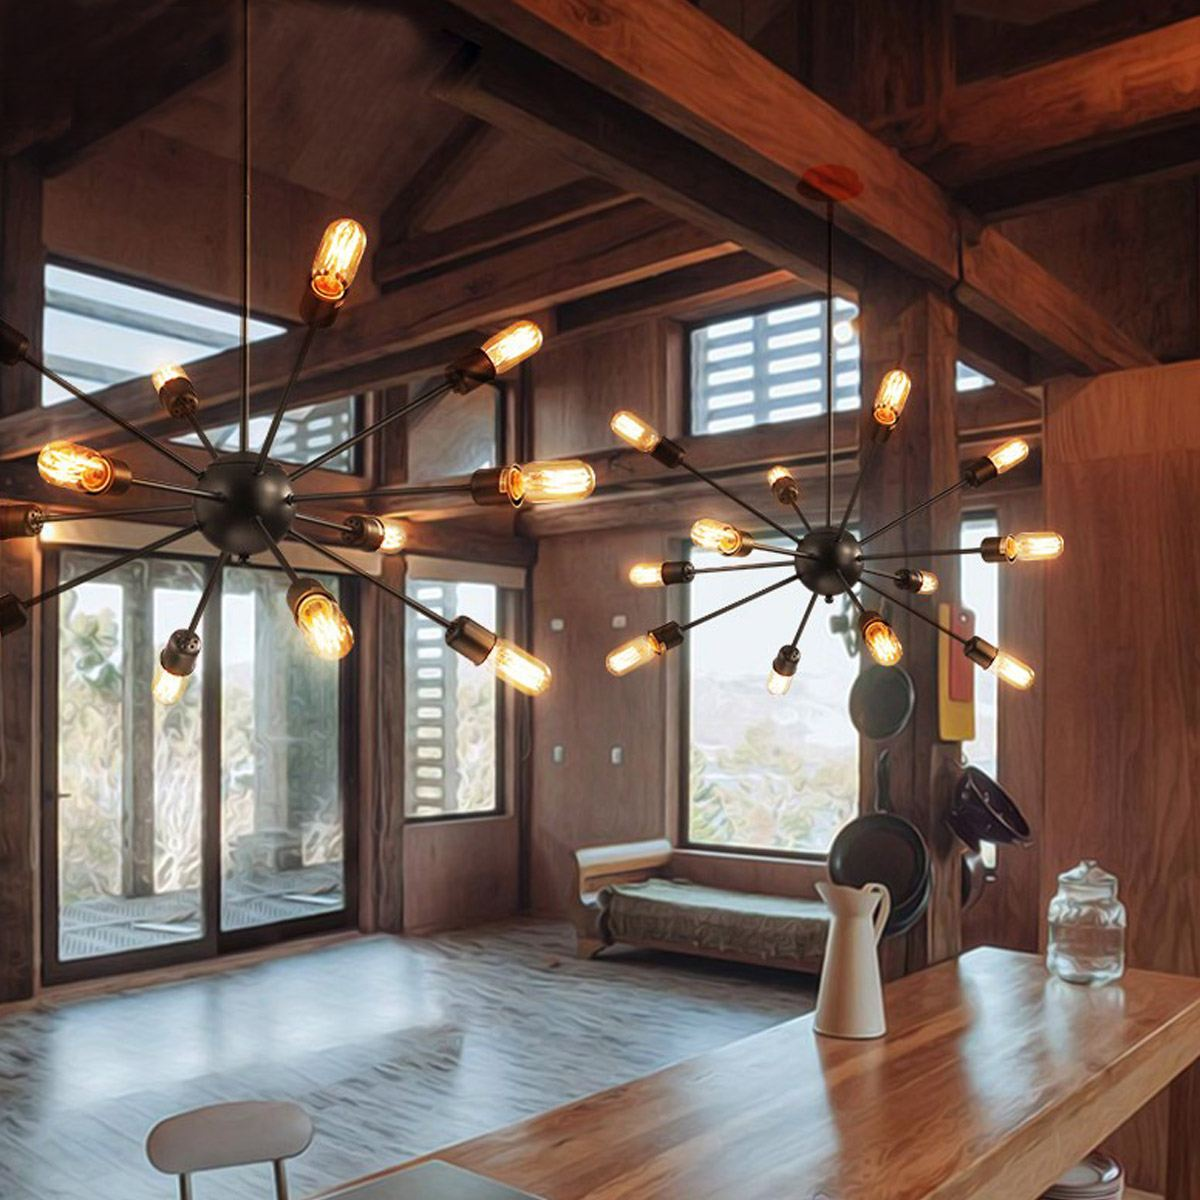 12Pcs E27 Bulb Vintage Ceiling Lights Lamps For Living Room ...